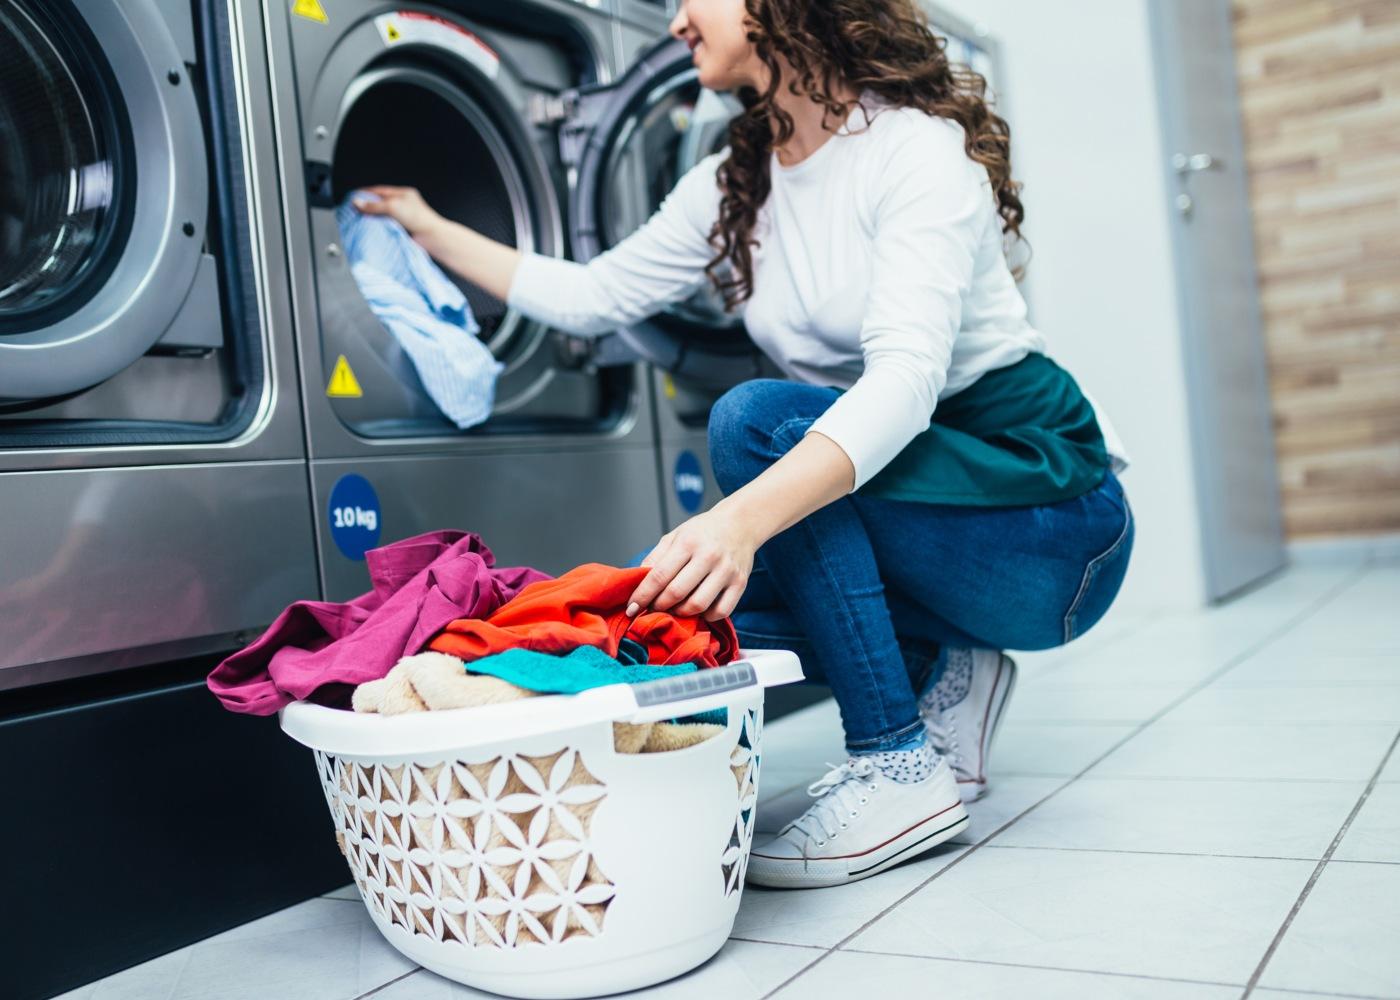 lavandarias públicas roupa